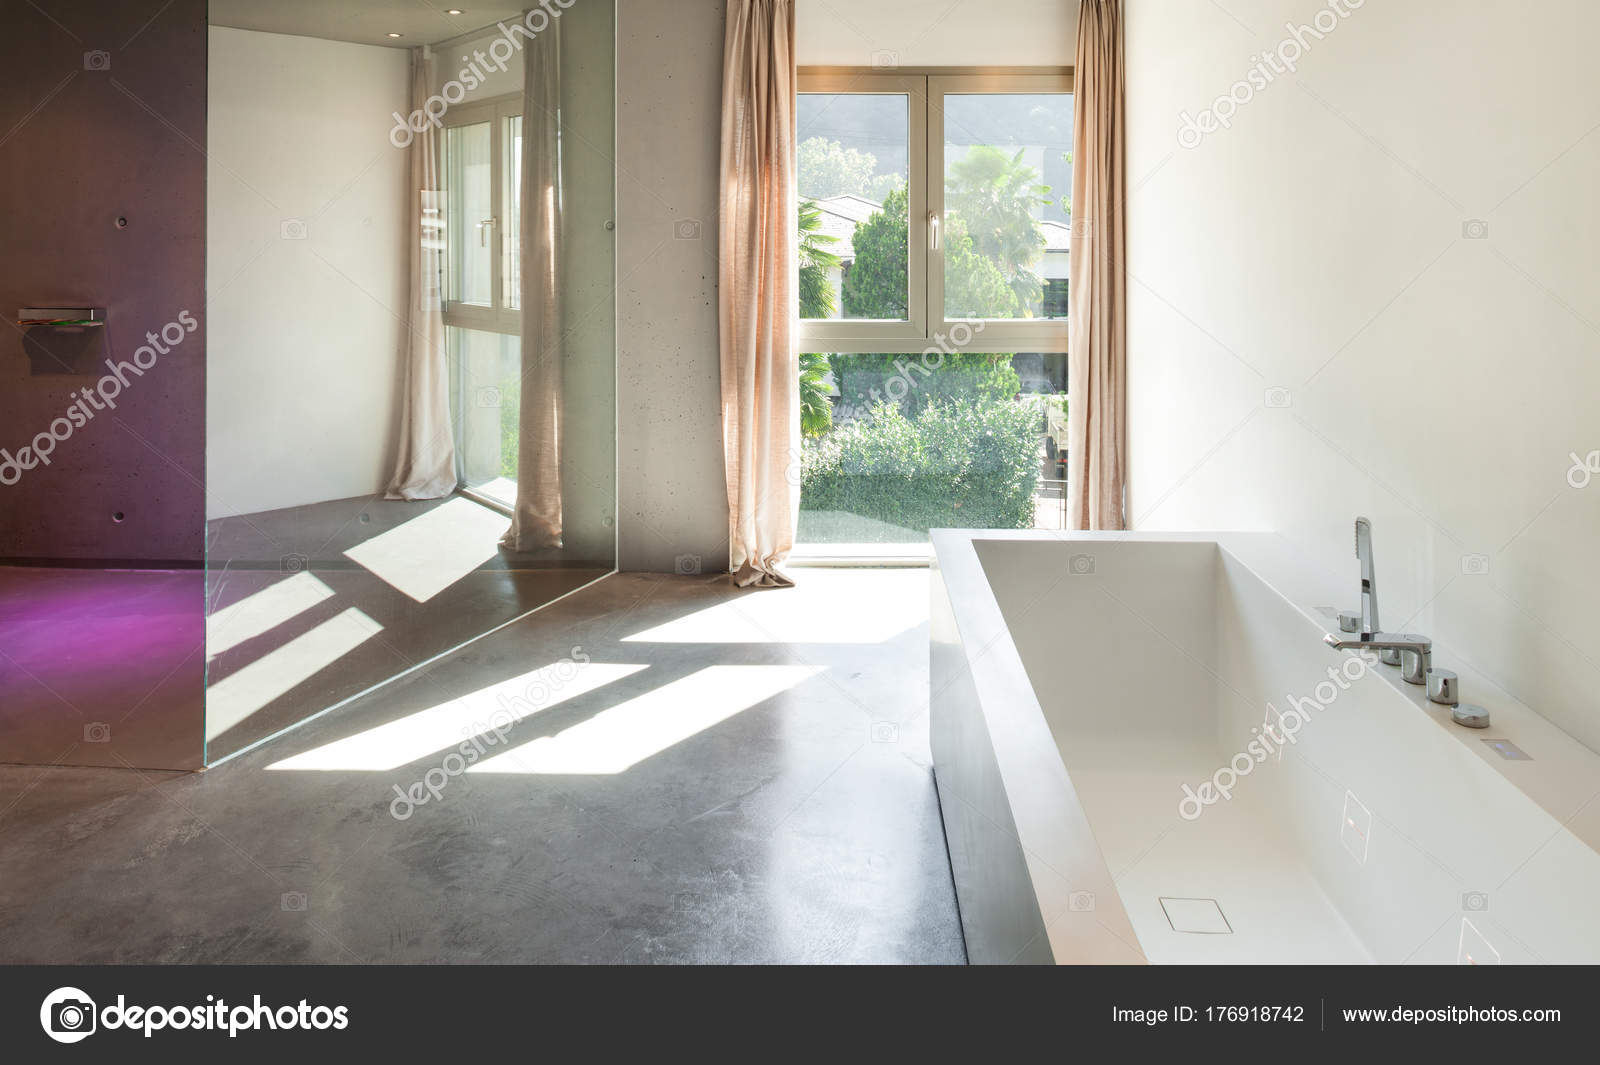 Salle De Bain Interieure Maison Moderne Photographie Zveiger